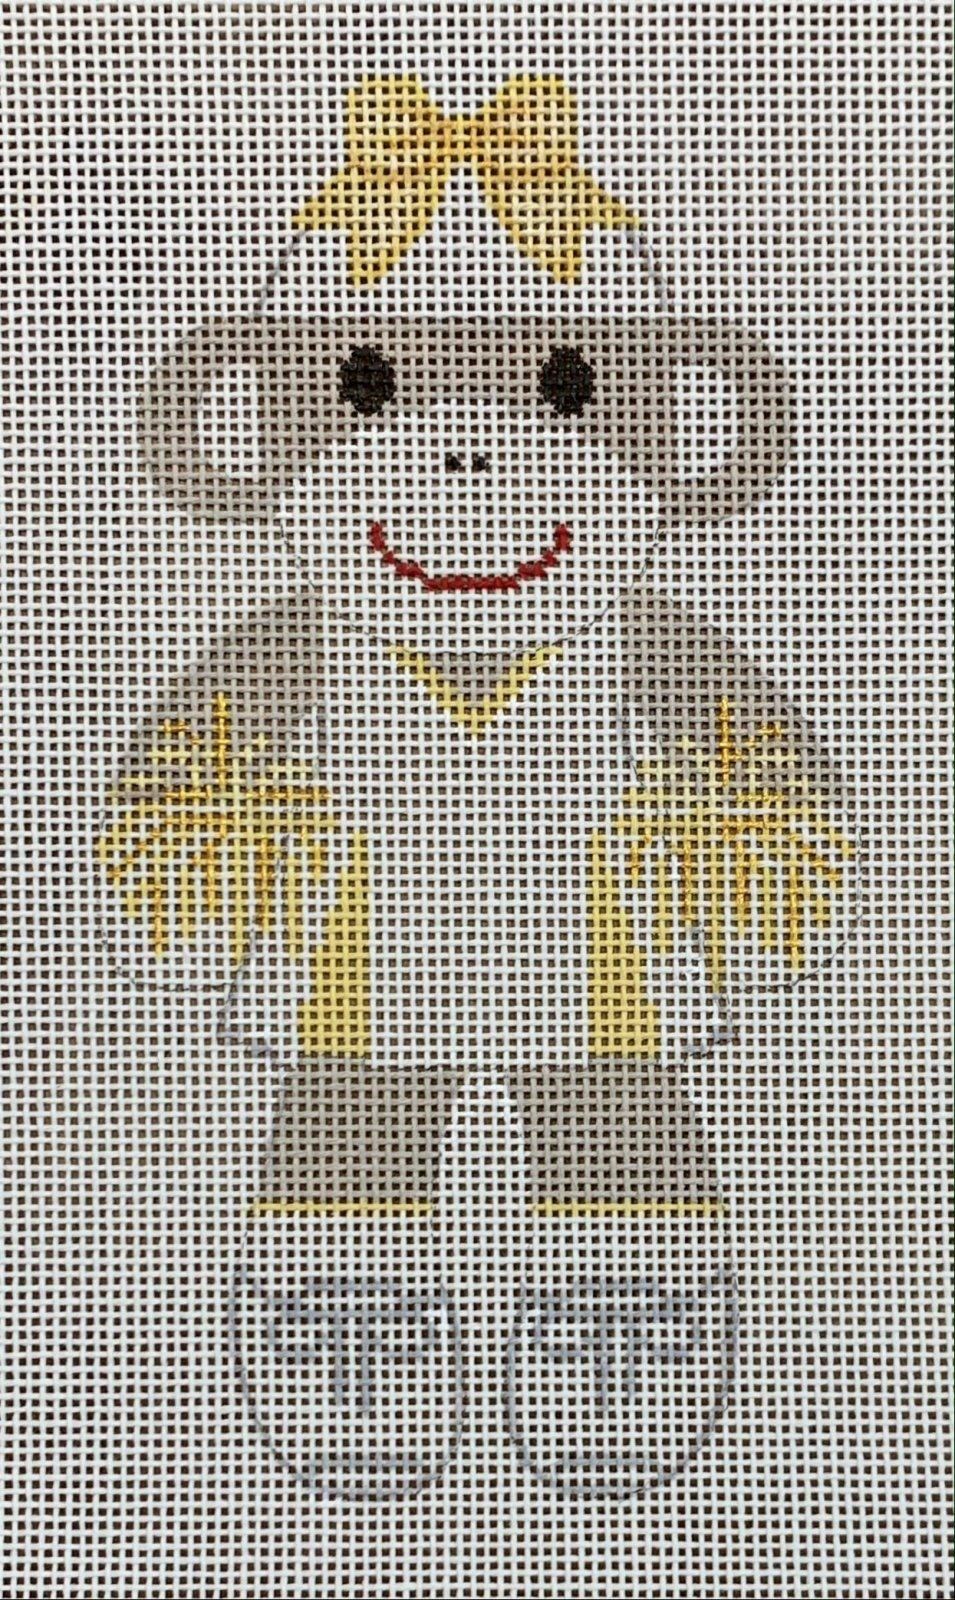 Sock Monkey - Cheerleader - Gold